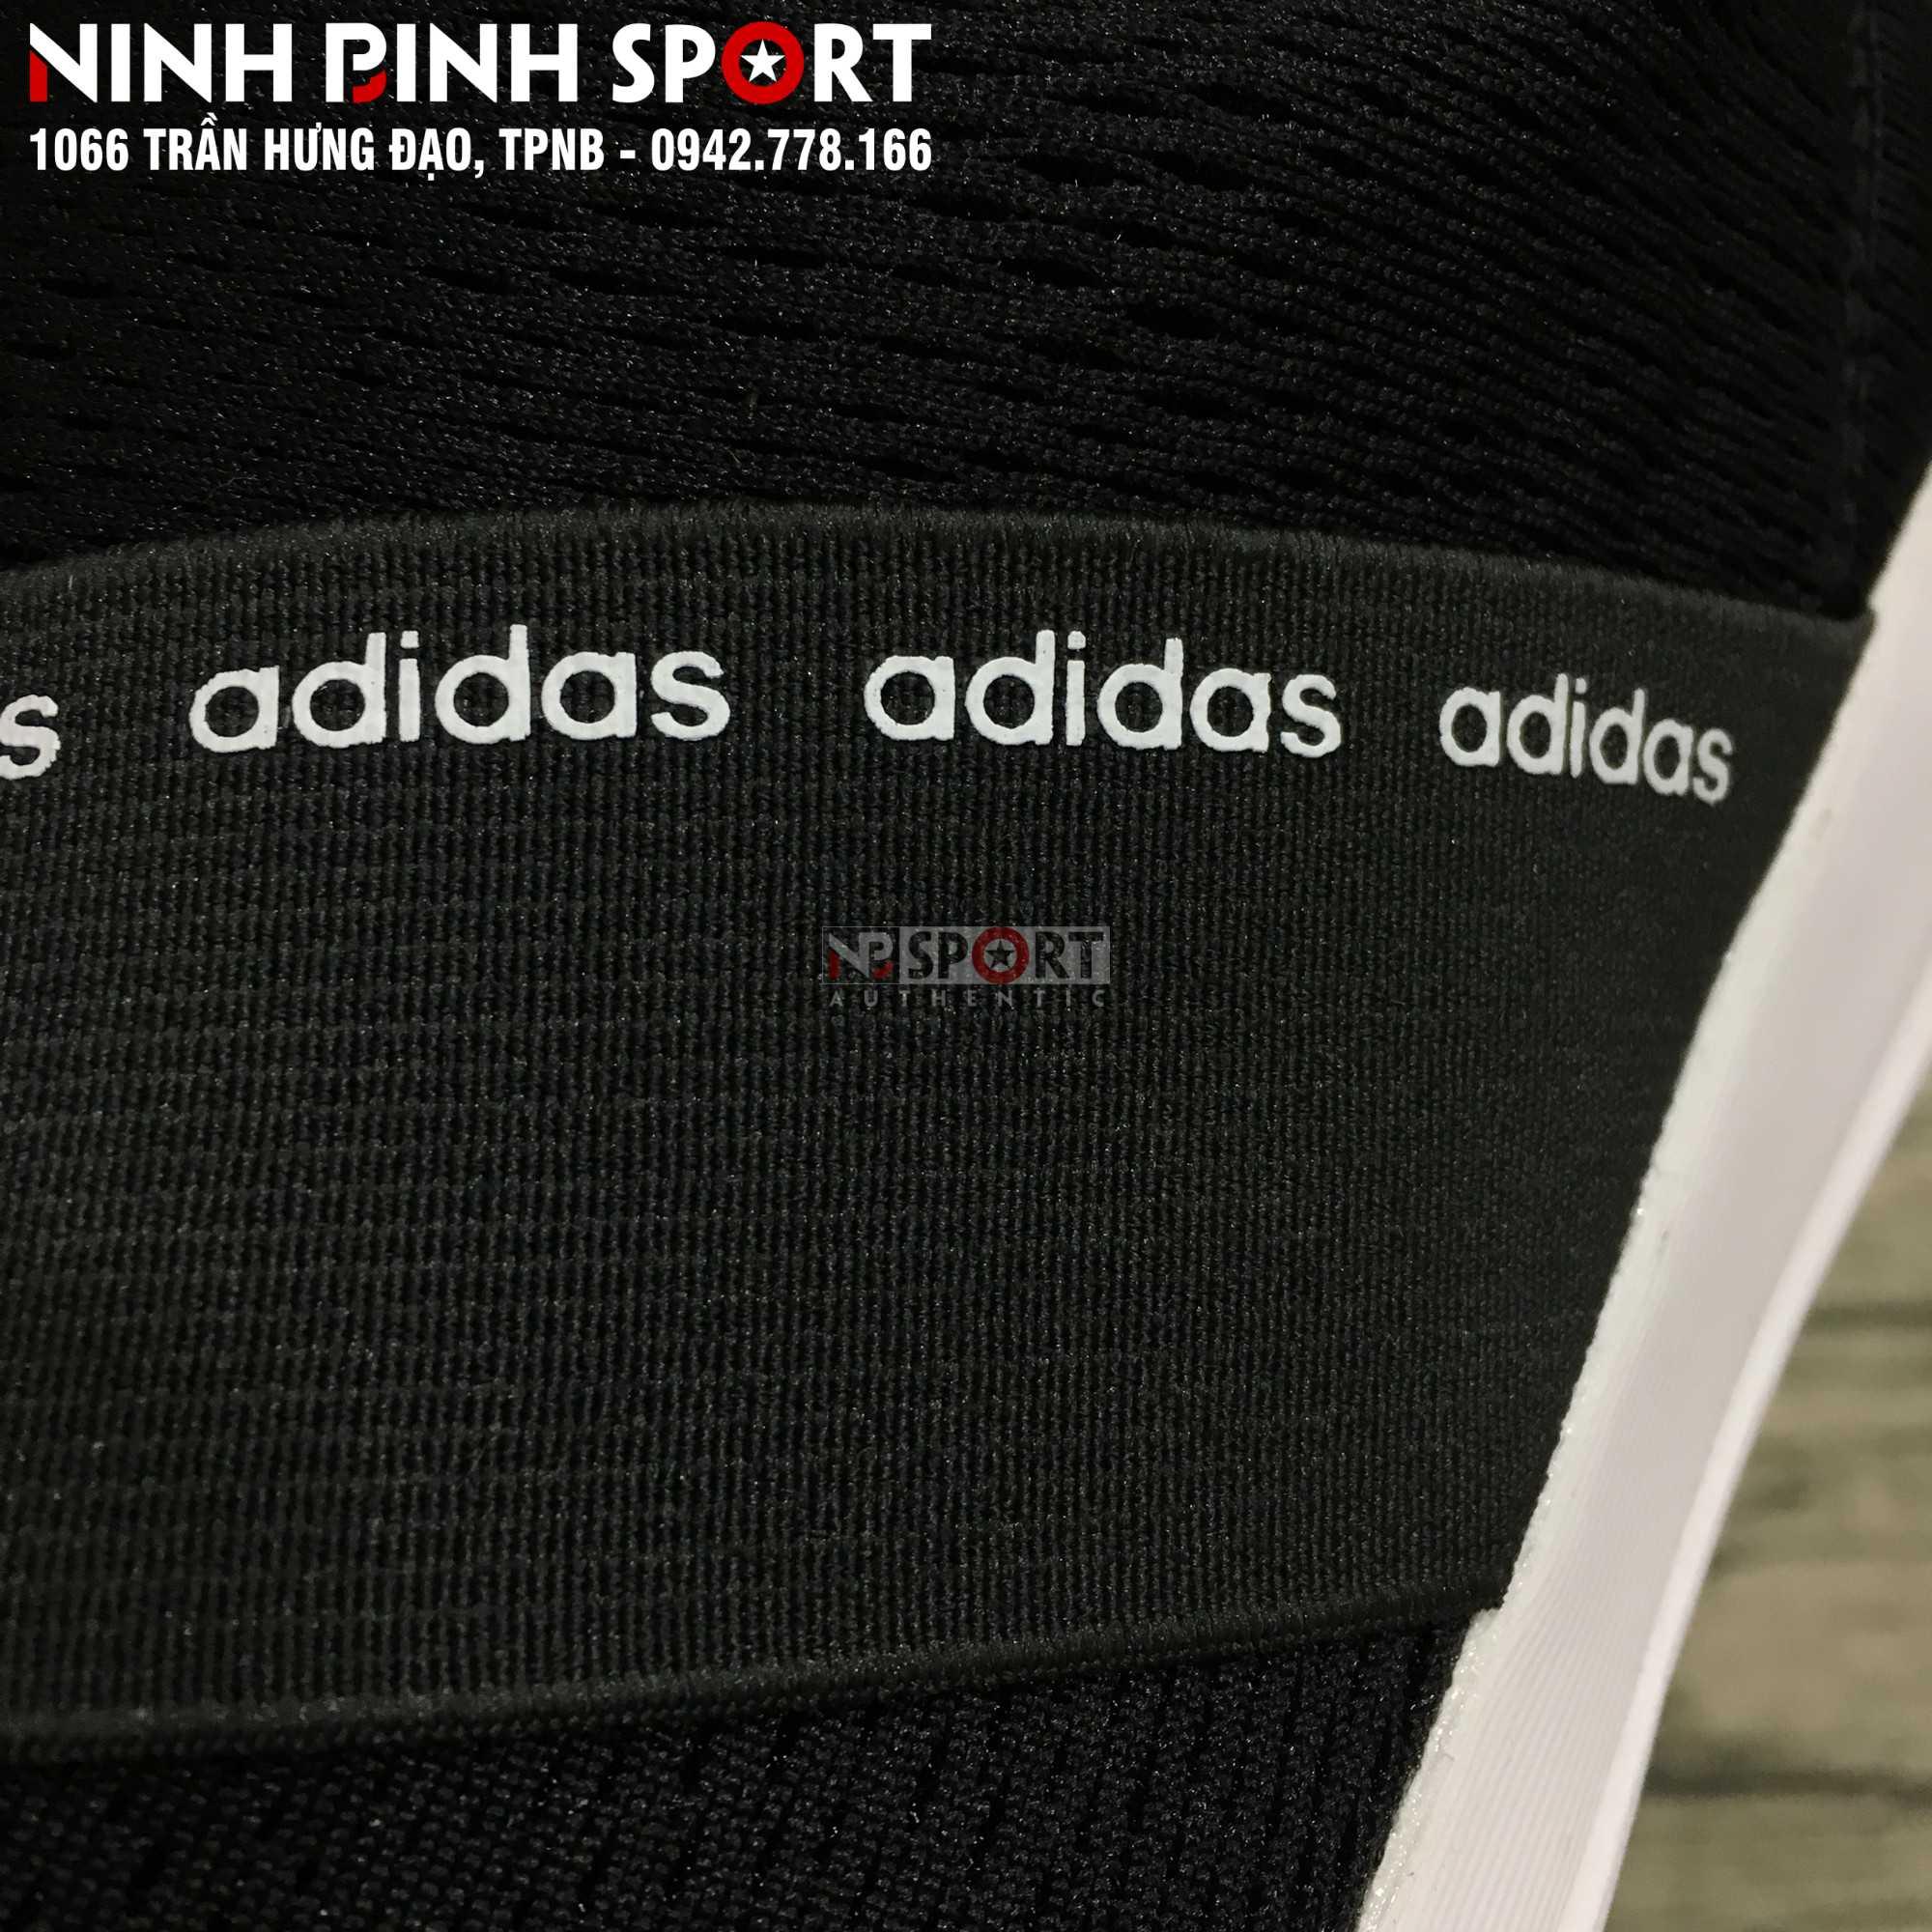 Giầy thể thao nữ Adidas Cloudfoam Refine Adapt DB1339